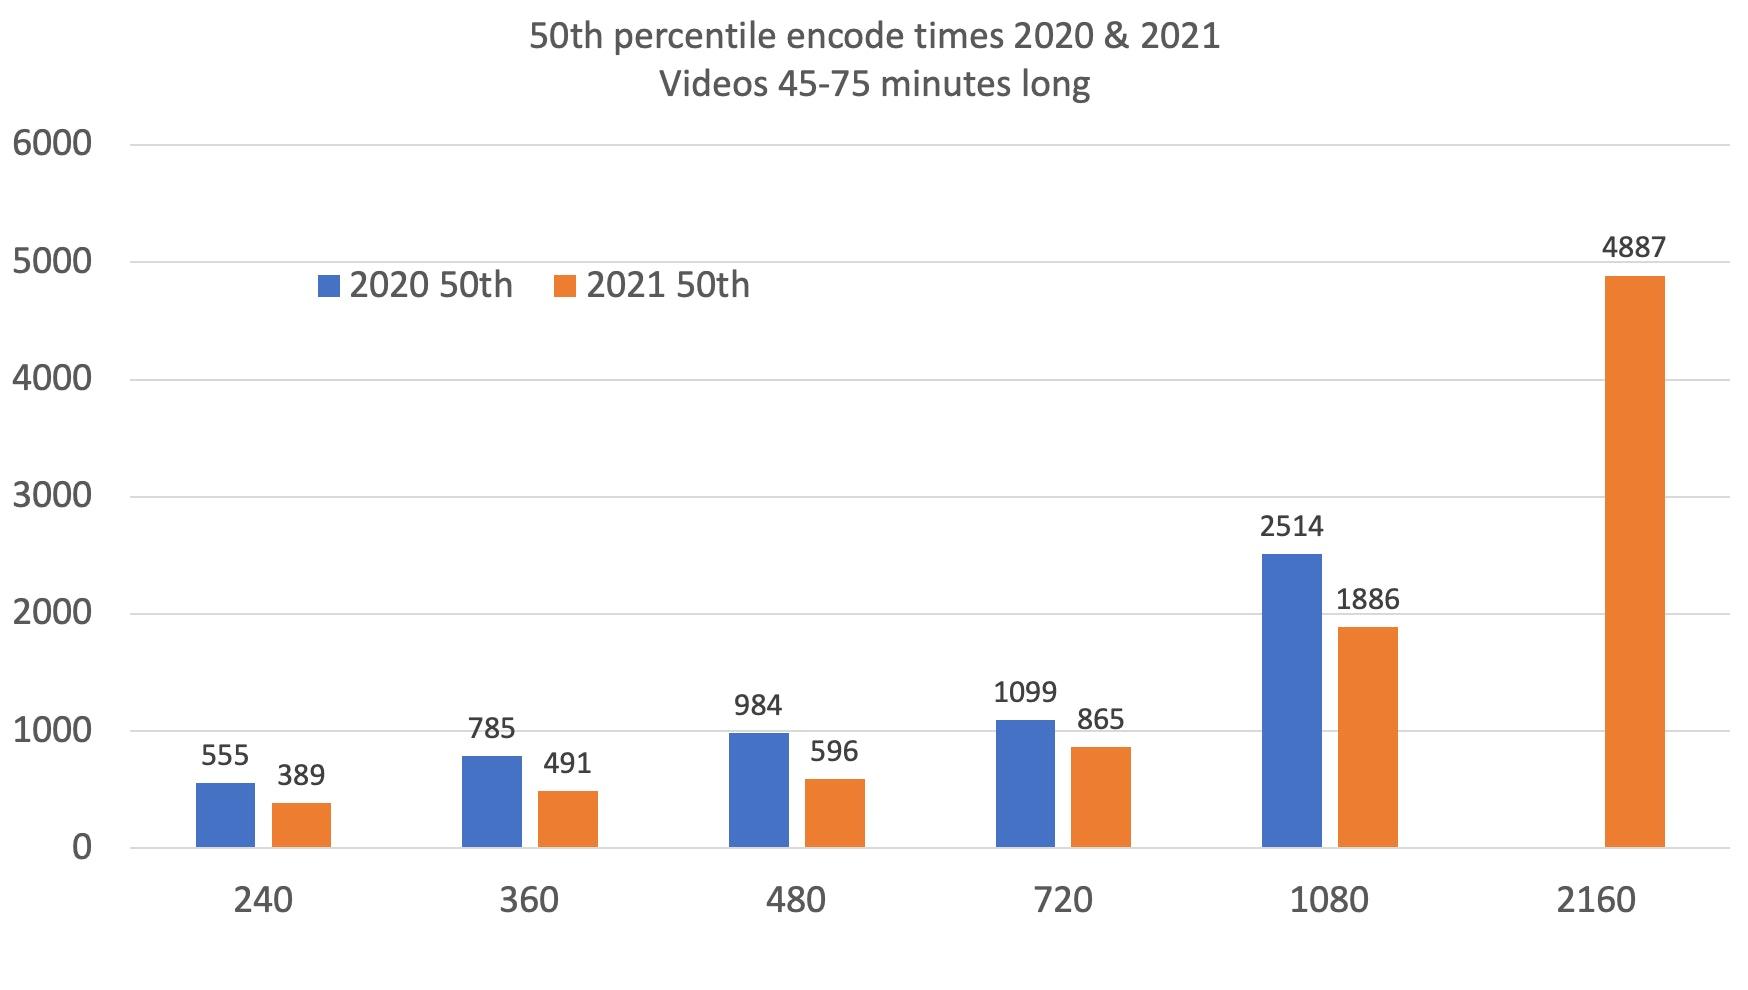 50th percentile encode data